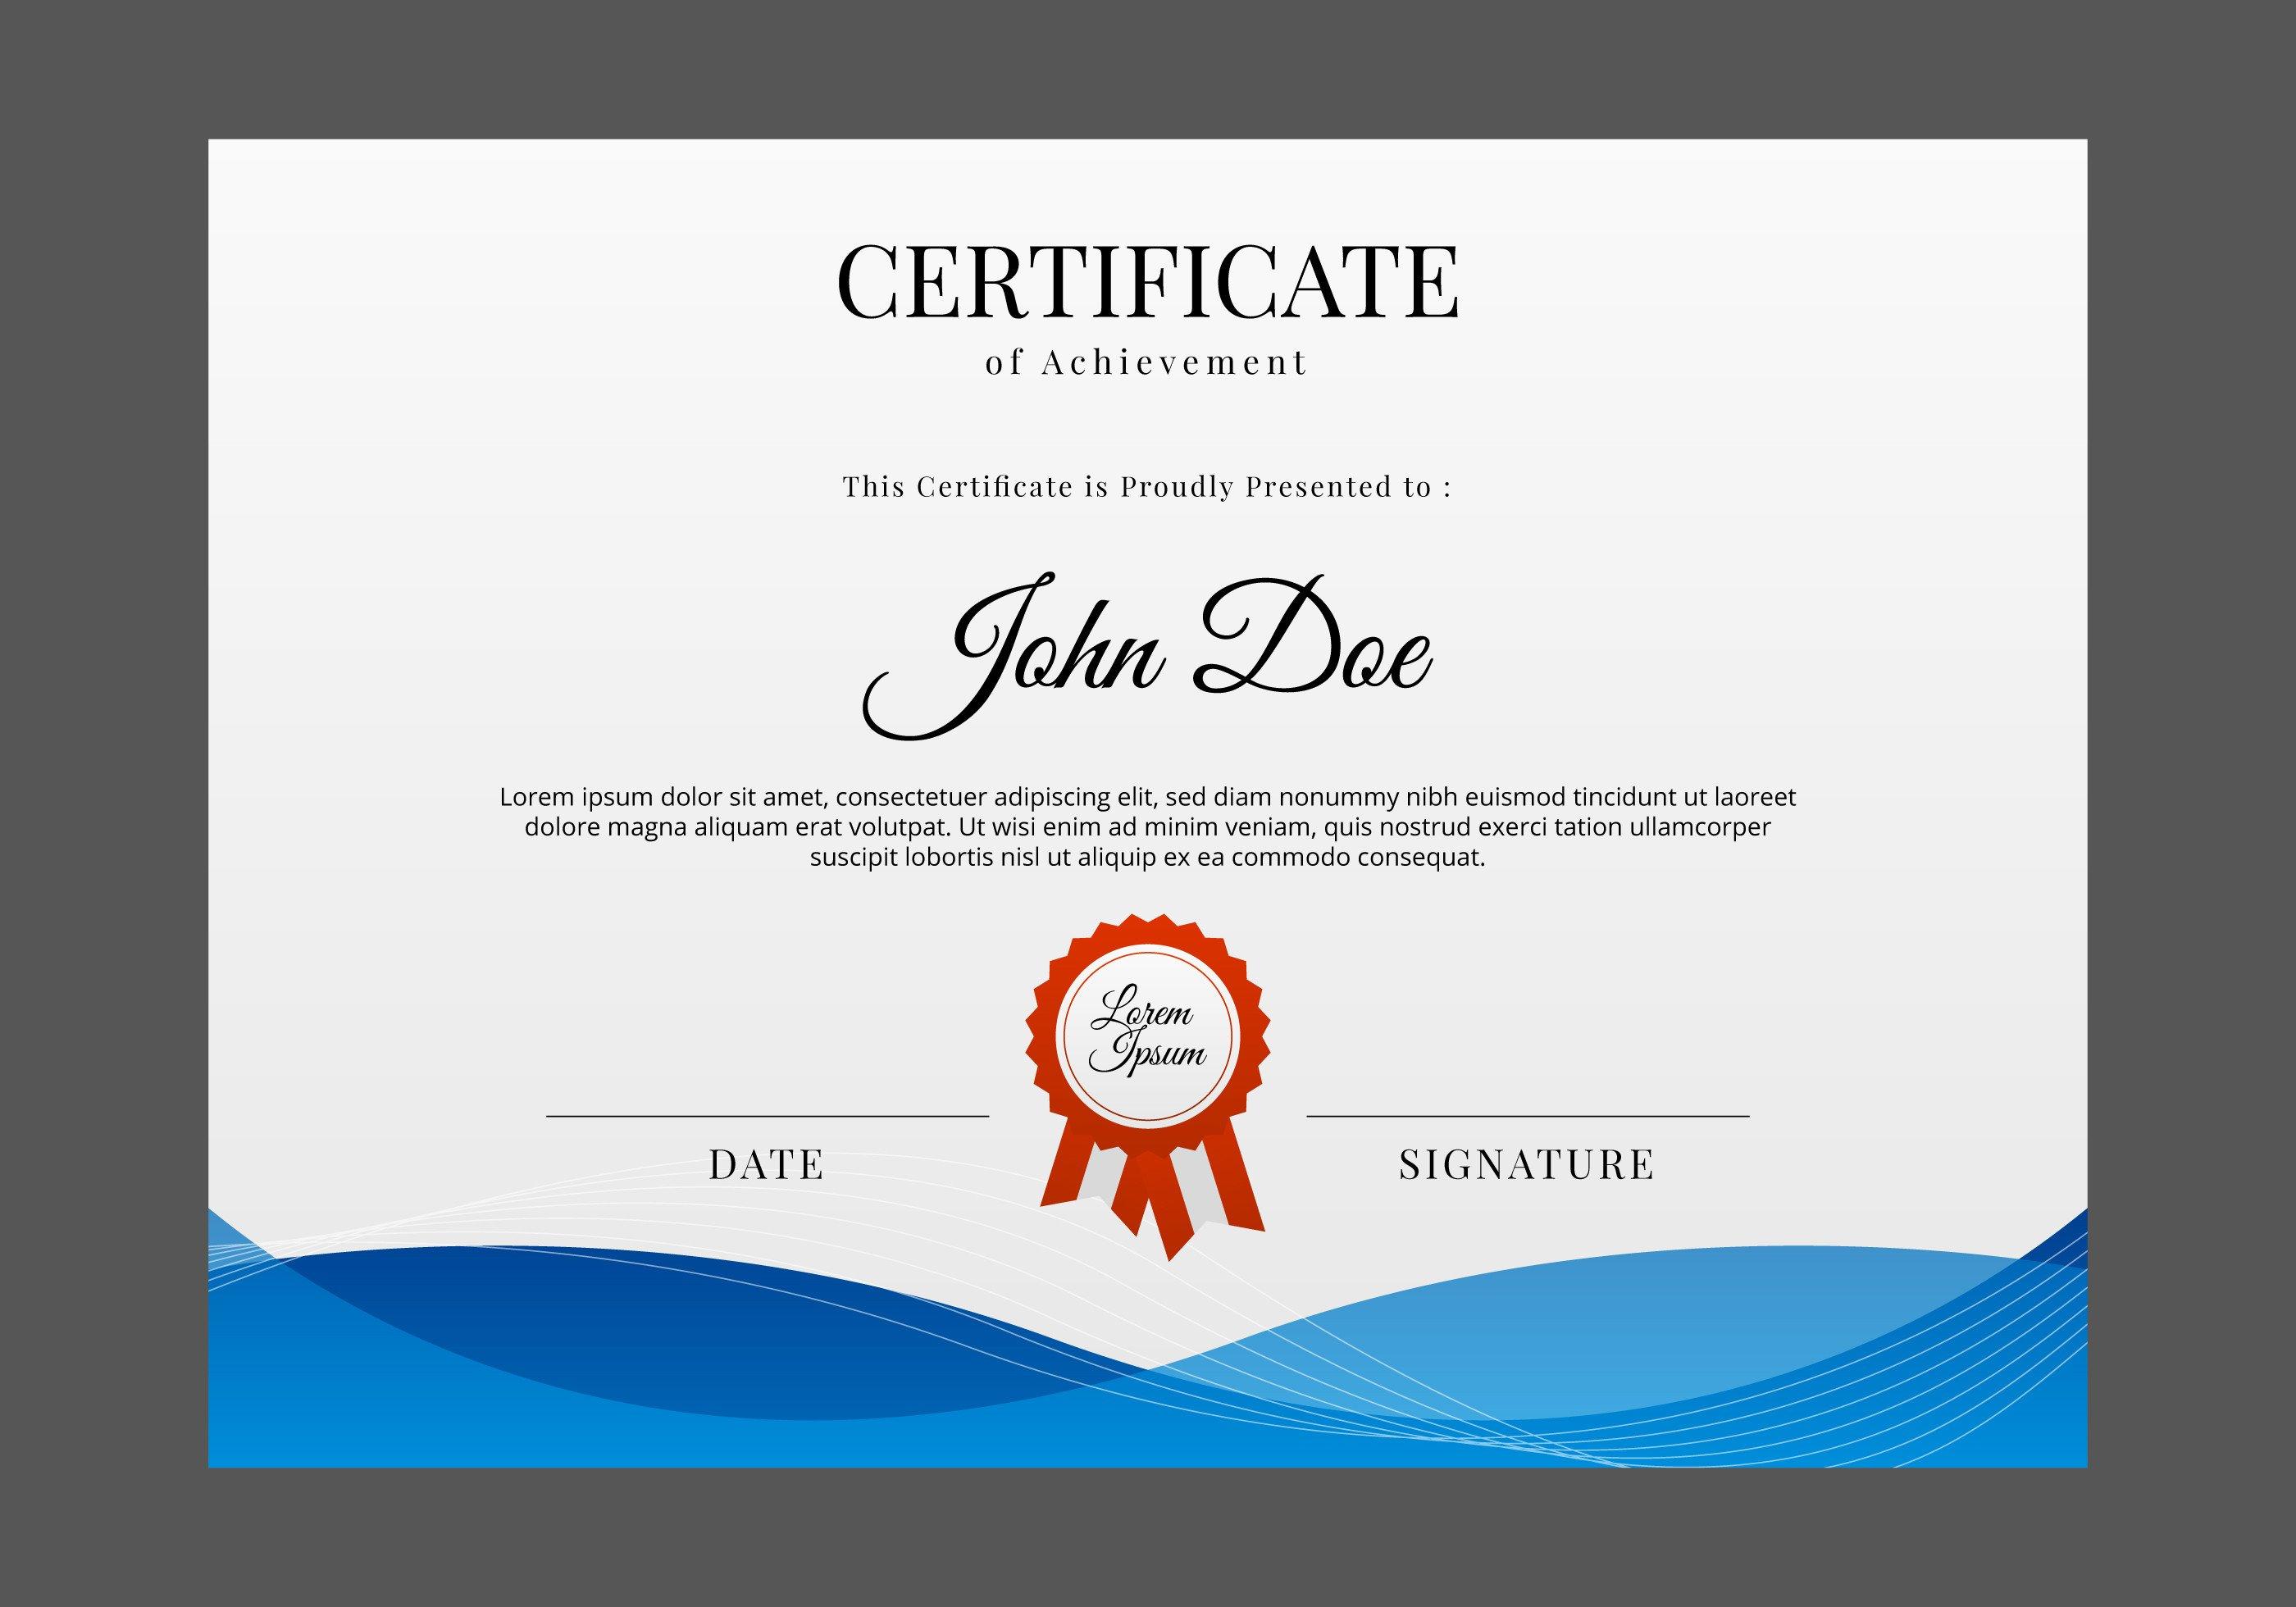 Free Printable Diploma Template Certificate Templates Free Certificate Designs